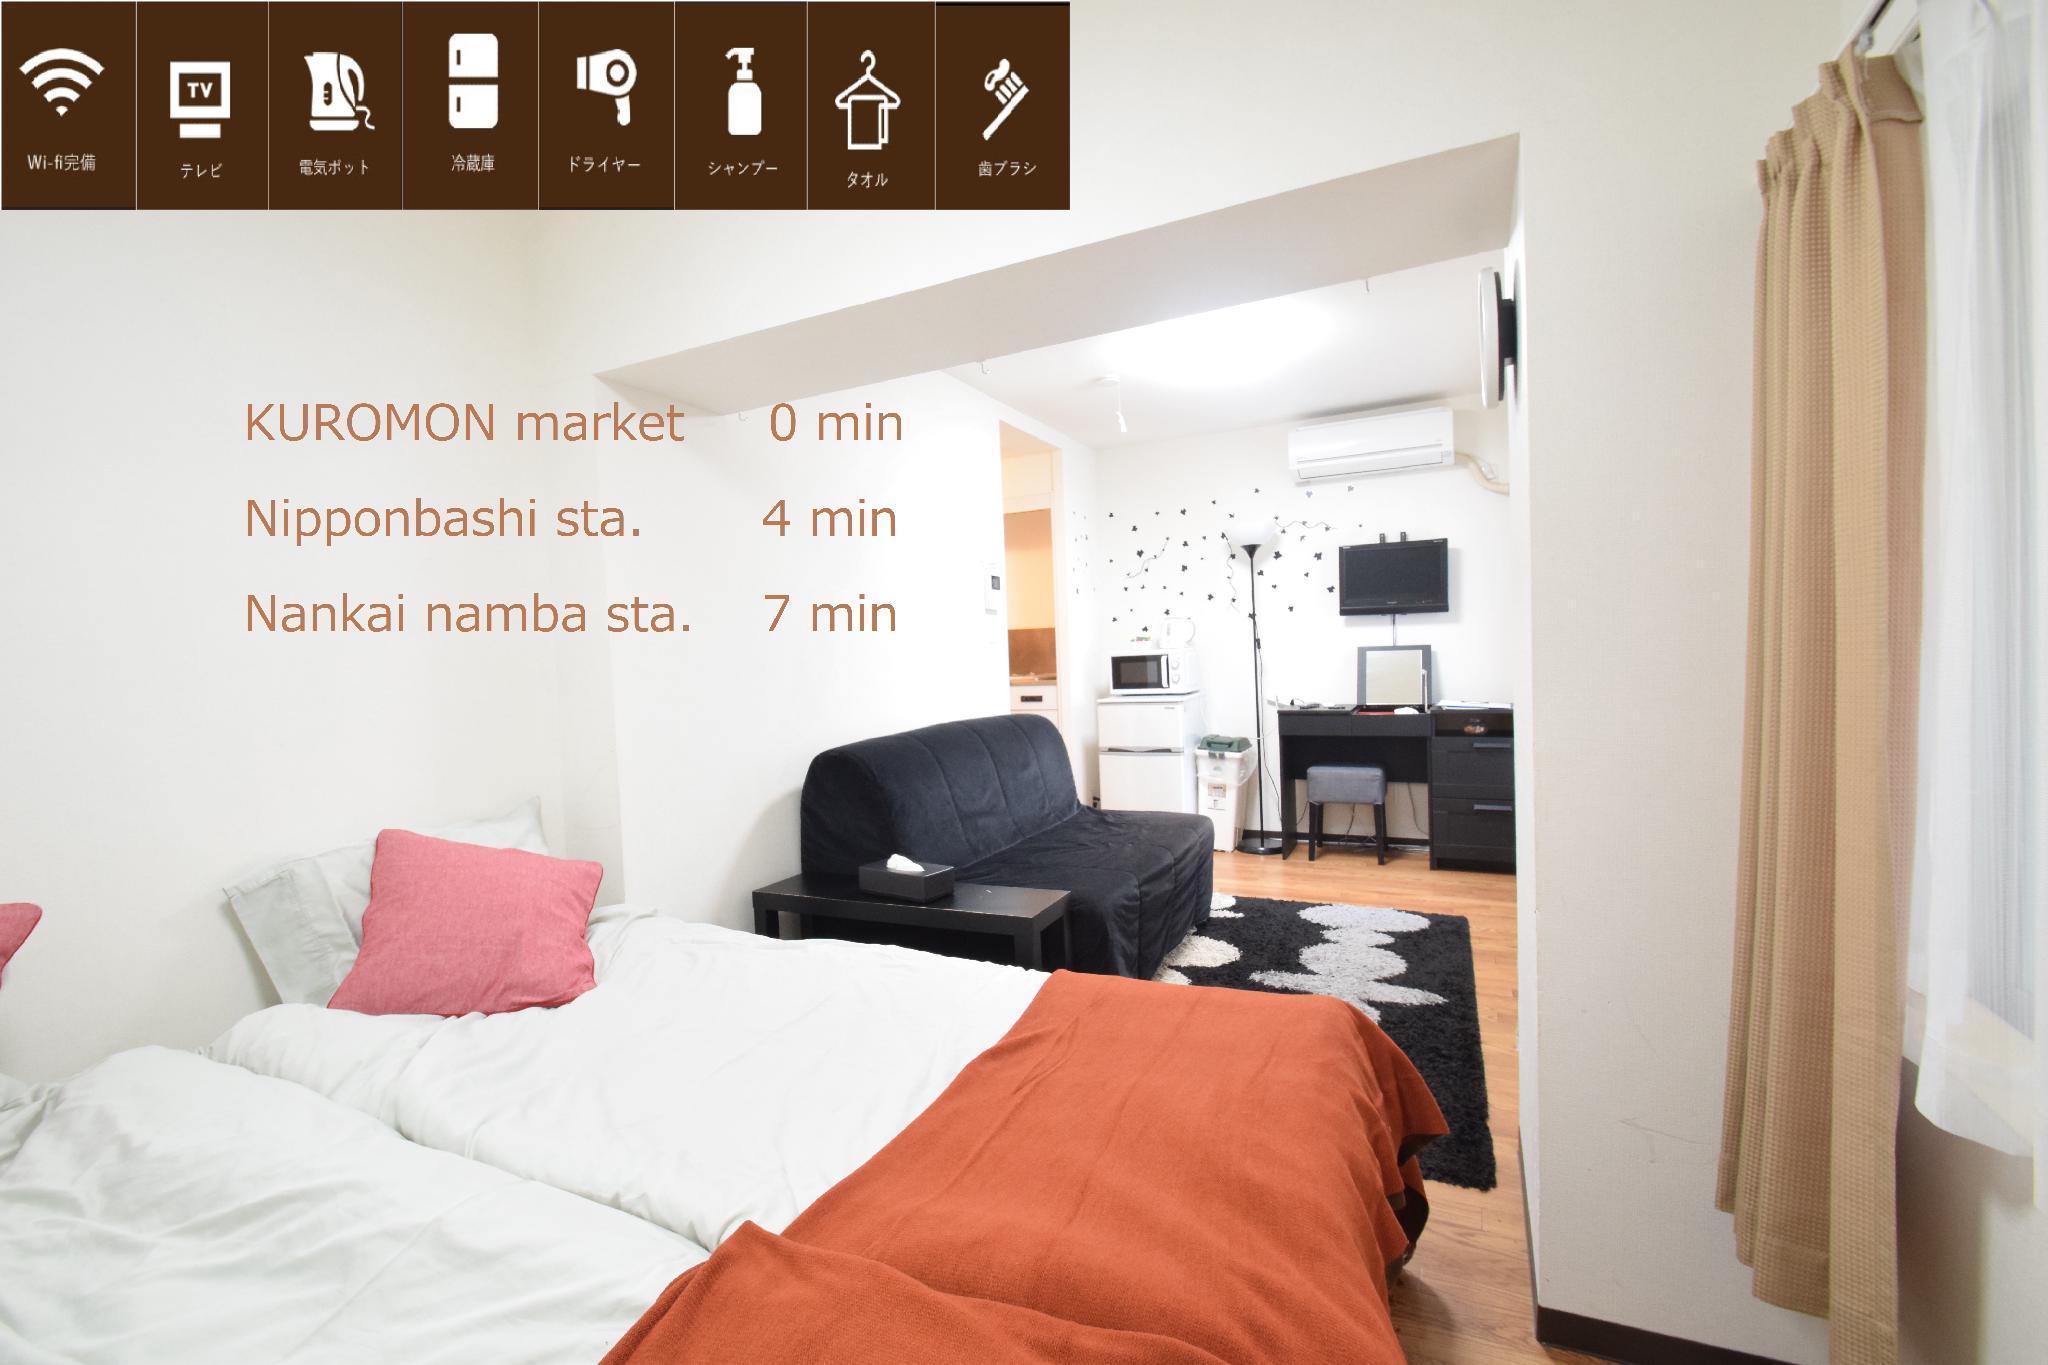 SandW 1 Bedroom Apt Near Kuromon Market 301